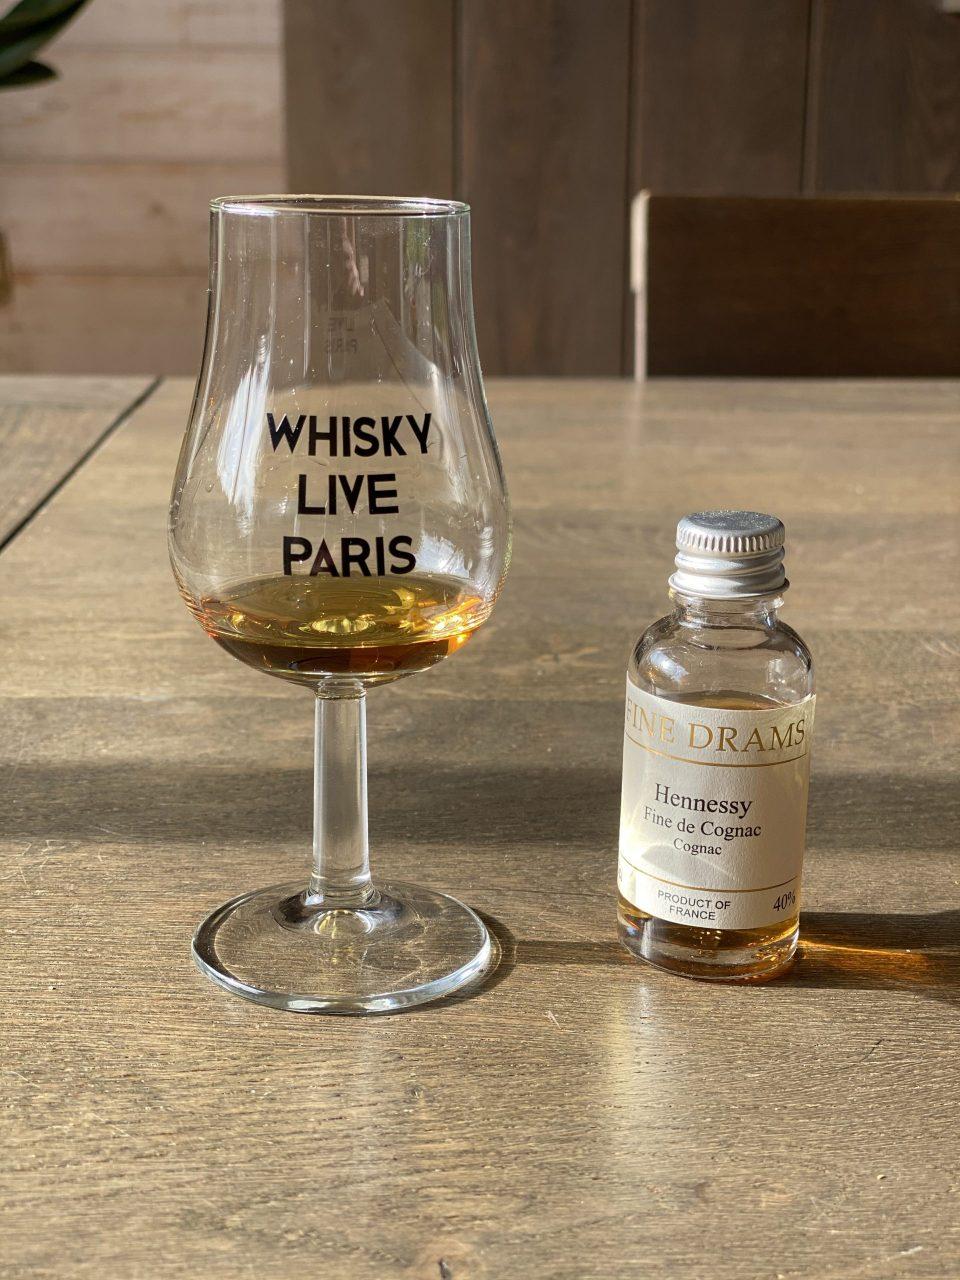 Hennessy Fine de Cognac tasting notes 2